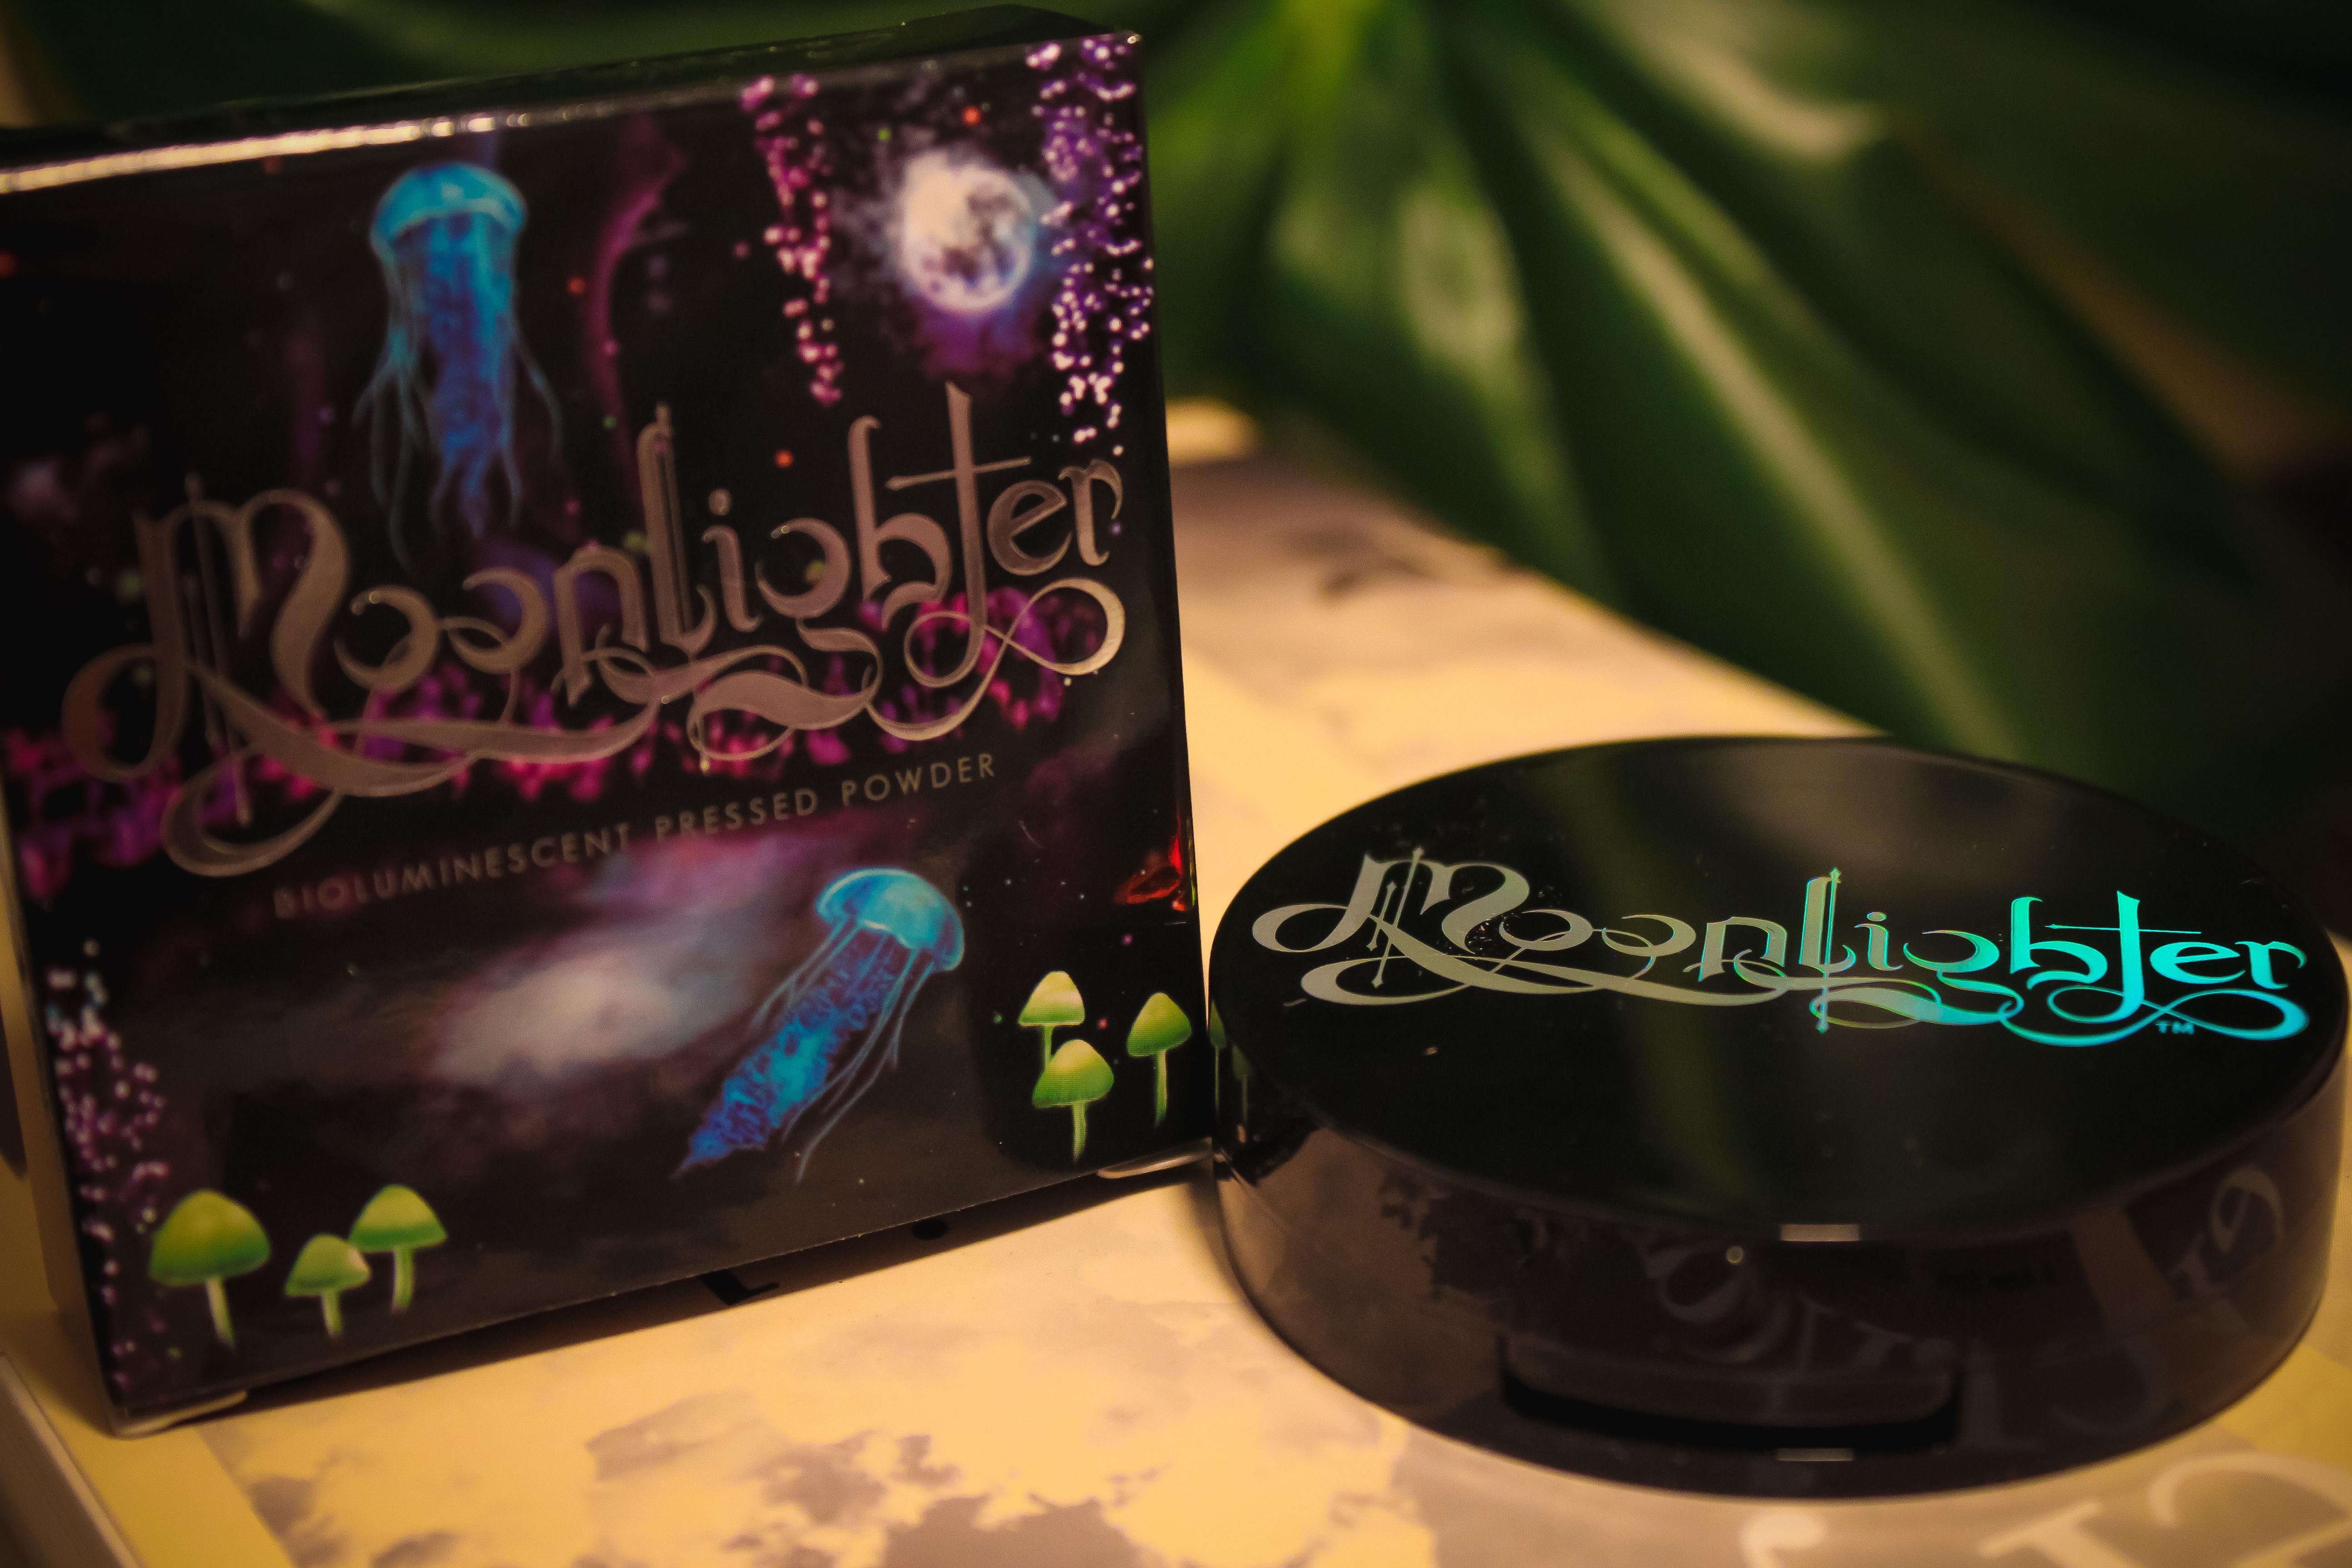 Black Moon Cosmetics Moonlighter Pressed Powder